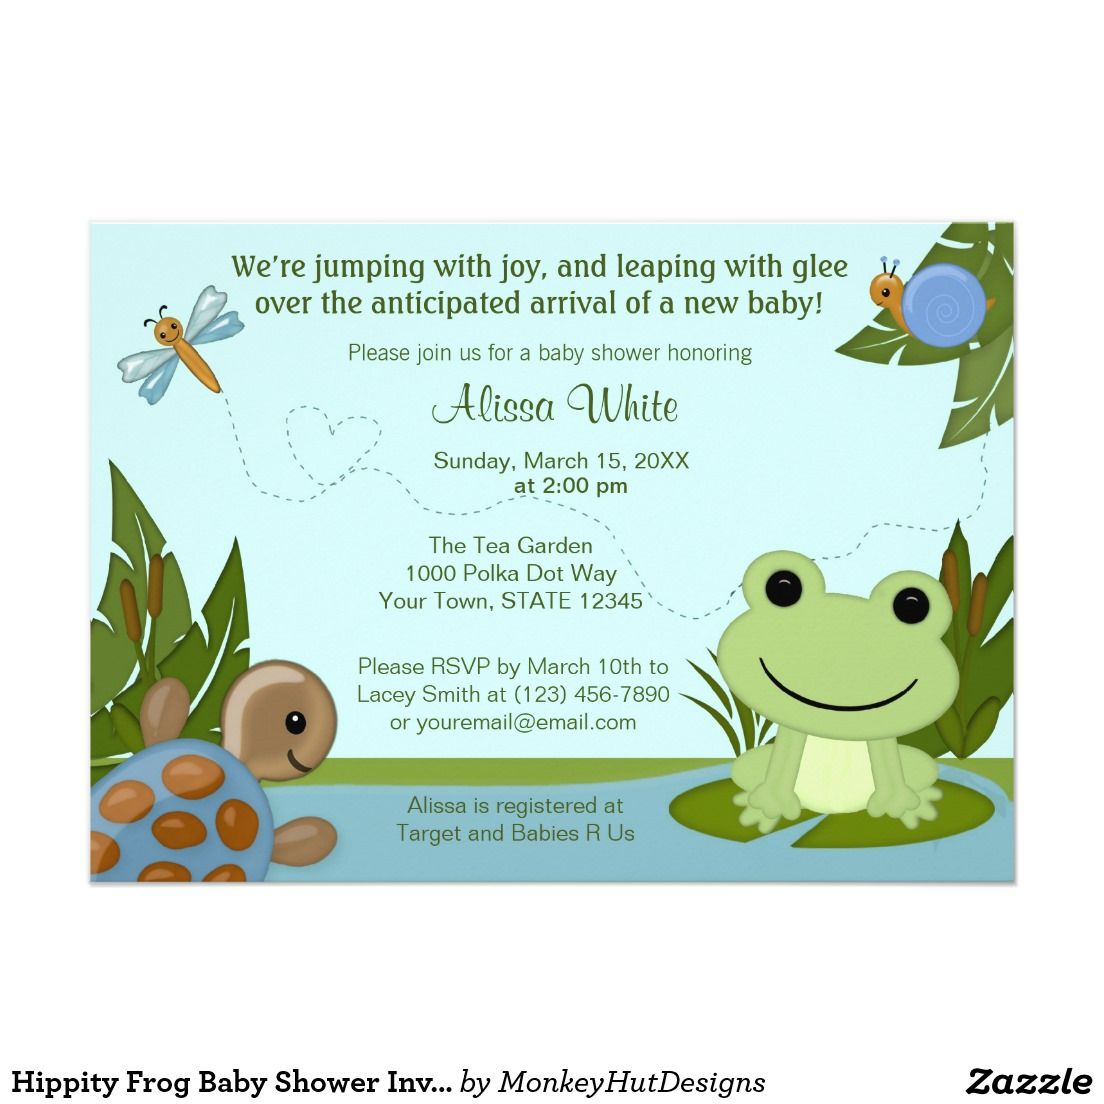 Hippity Frog Baby Shower Invitation turtle snail 5\